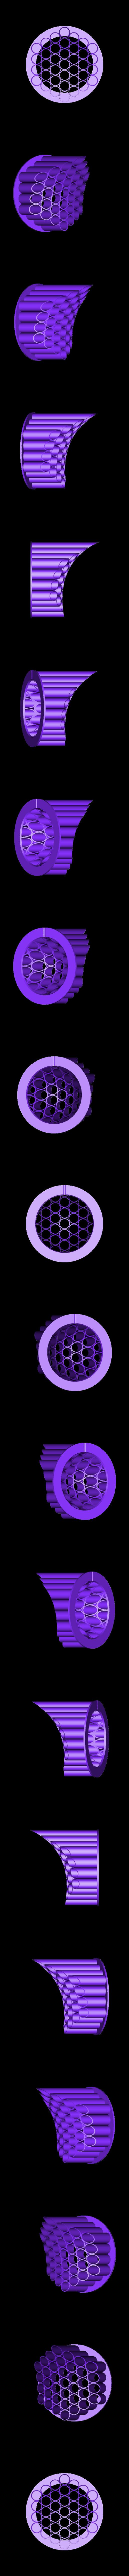 cylinders3.stl Download free STL file Cylinders3 • 3D printing template, Birk